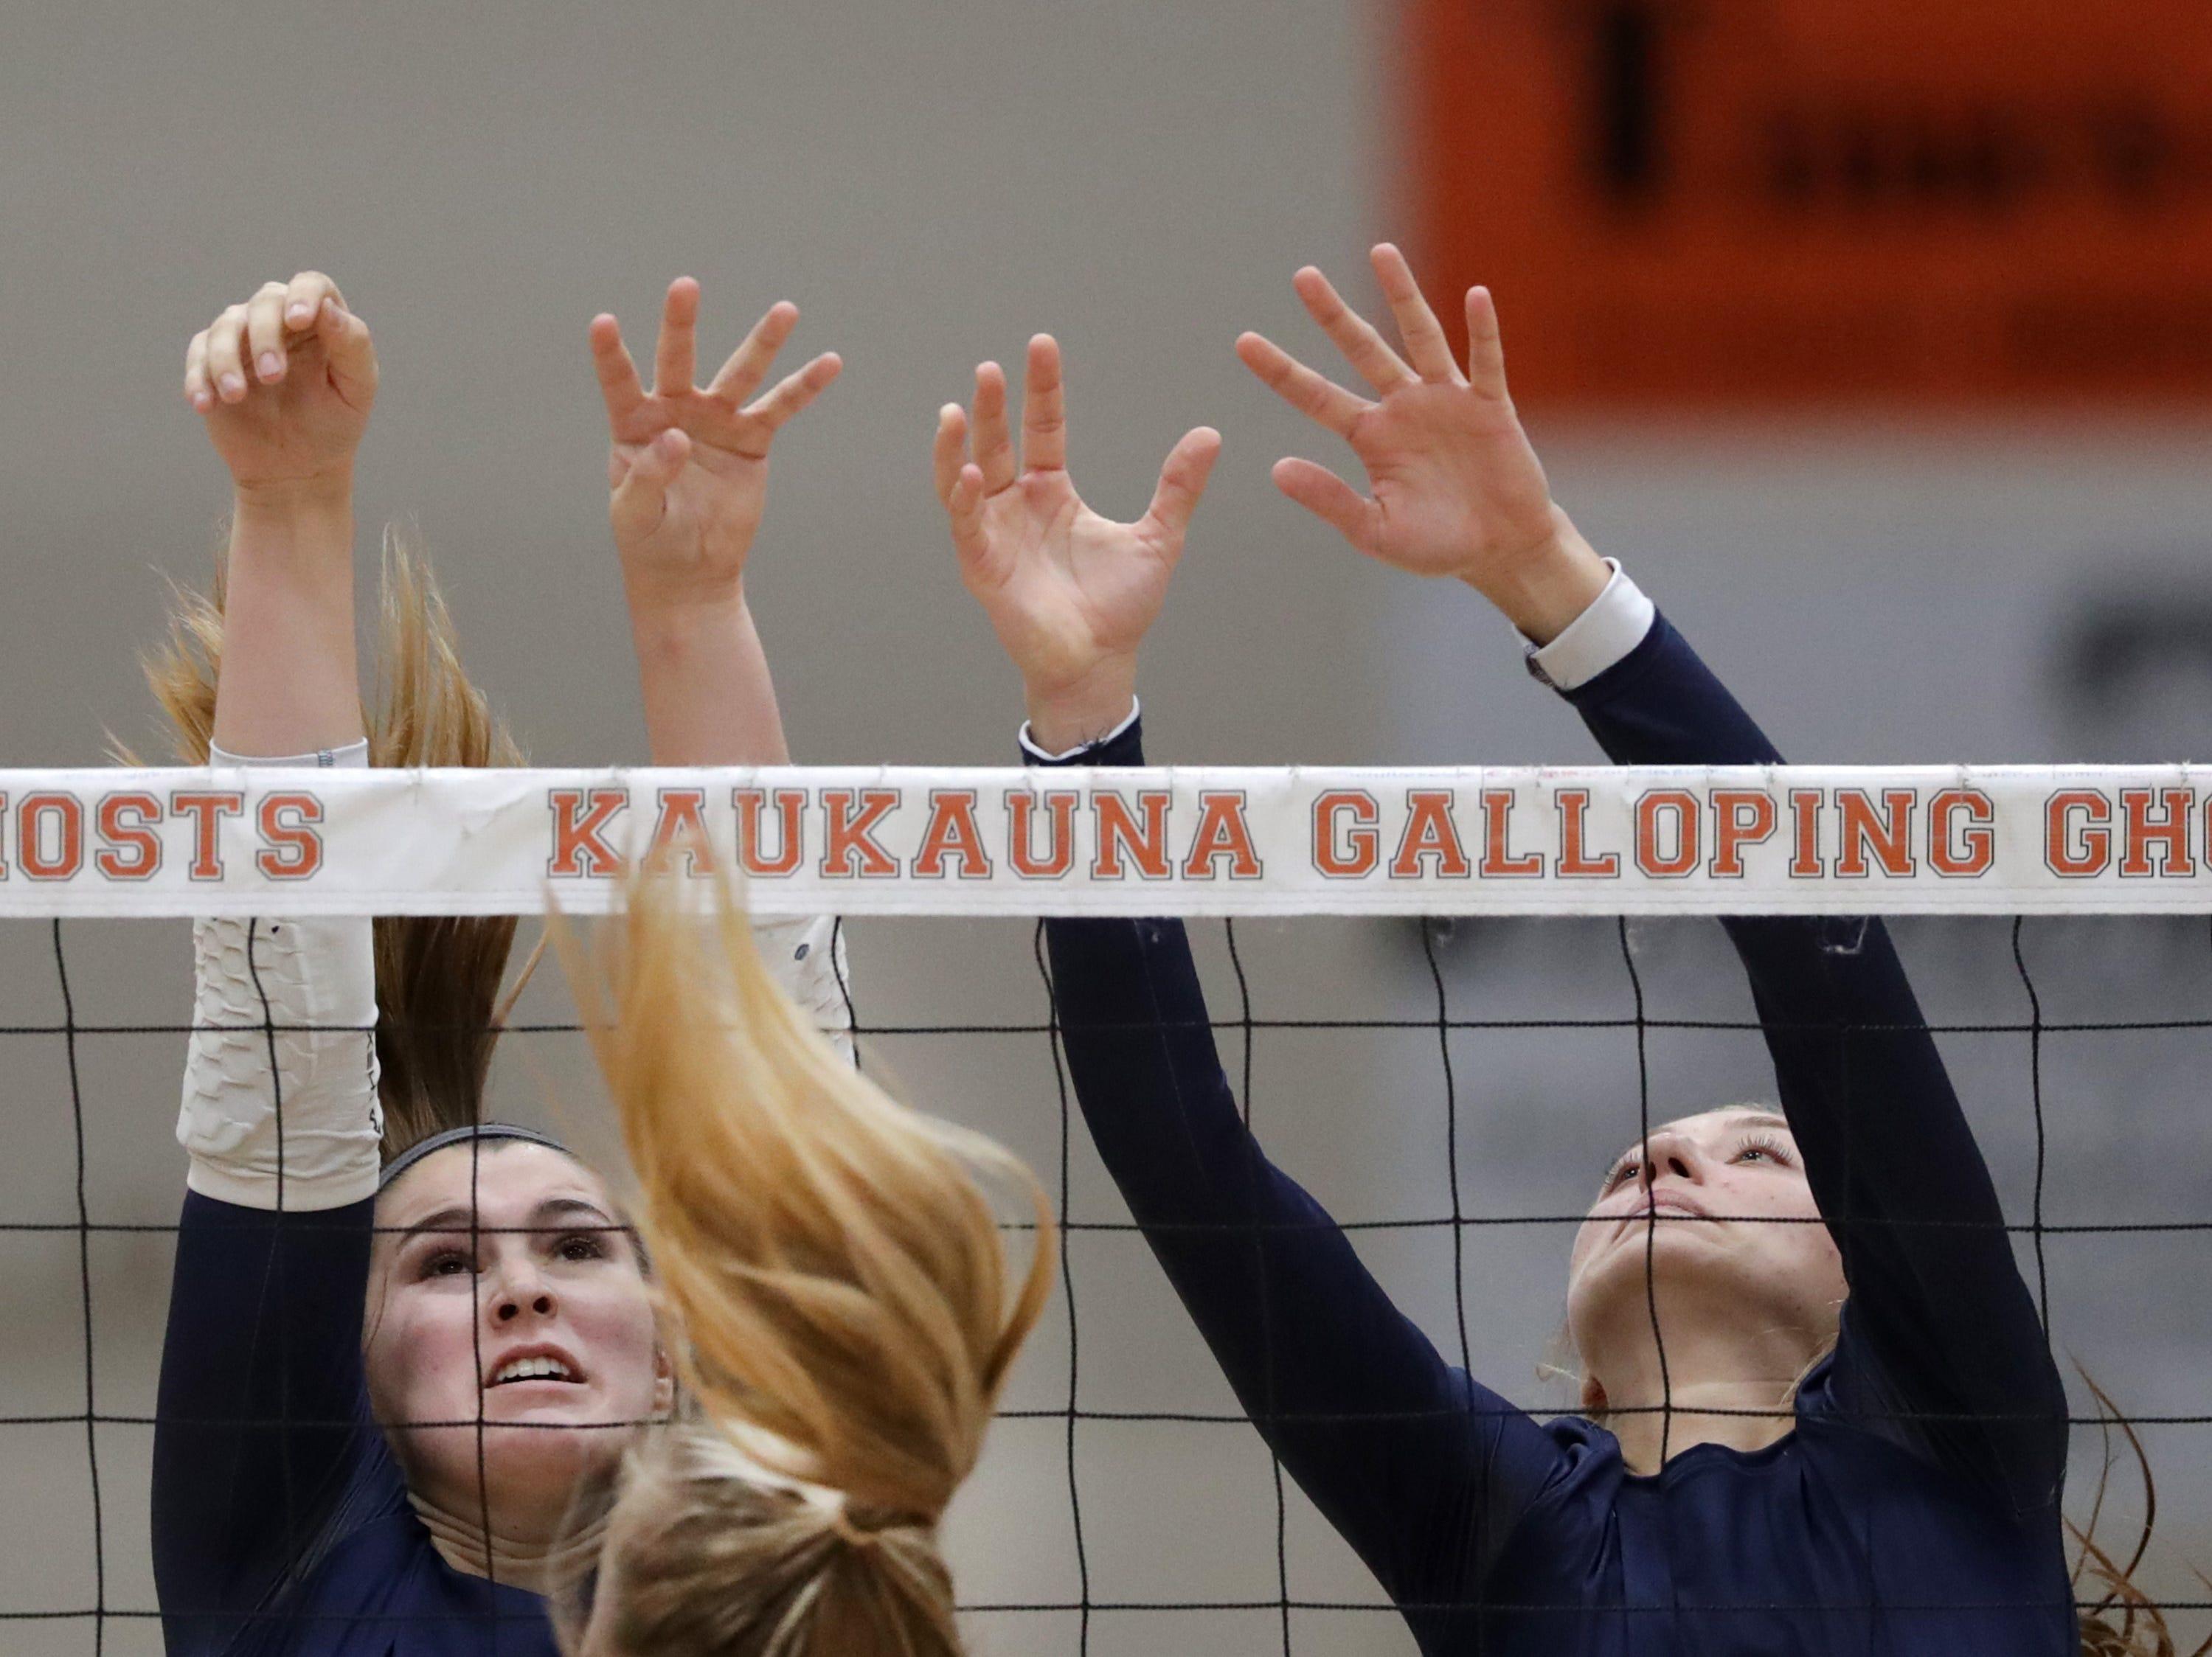 Appleton East High School's #8 Tiffany Paalman and #4 Cameron Neubauer against Kaukauna High School during their girls volleyball game on Thursday, October 11, 2018, in Kaukauna, Wis. Wm. Glasheen/USA TODAY NETWORK-Wisconsin.